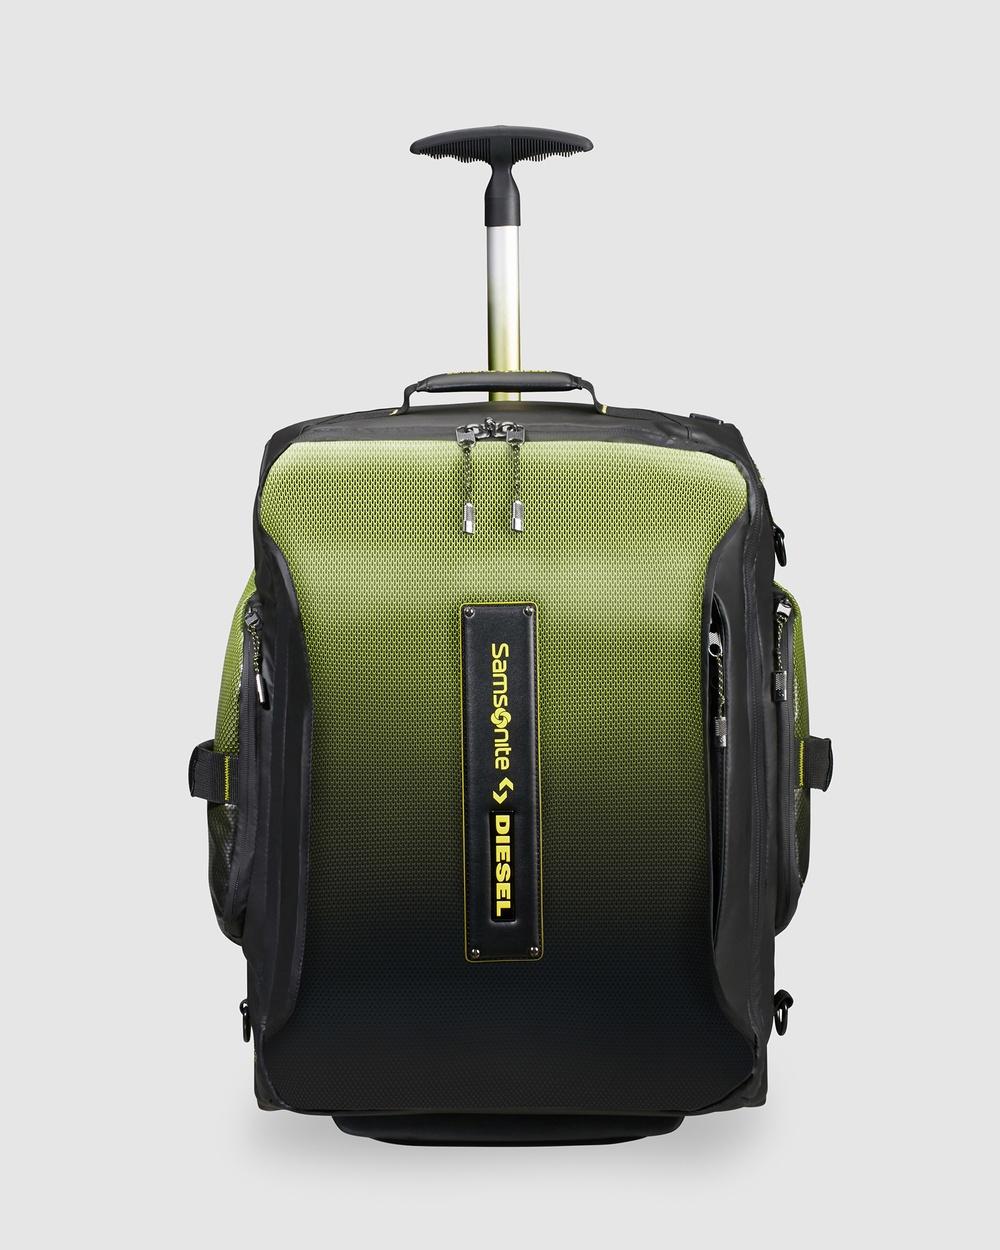 Samsonite Business Paradiver X Diesel Duffle Backpack 55cm Backpacks Black & Yellow